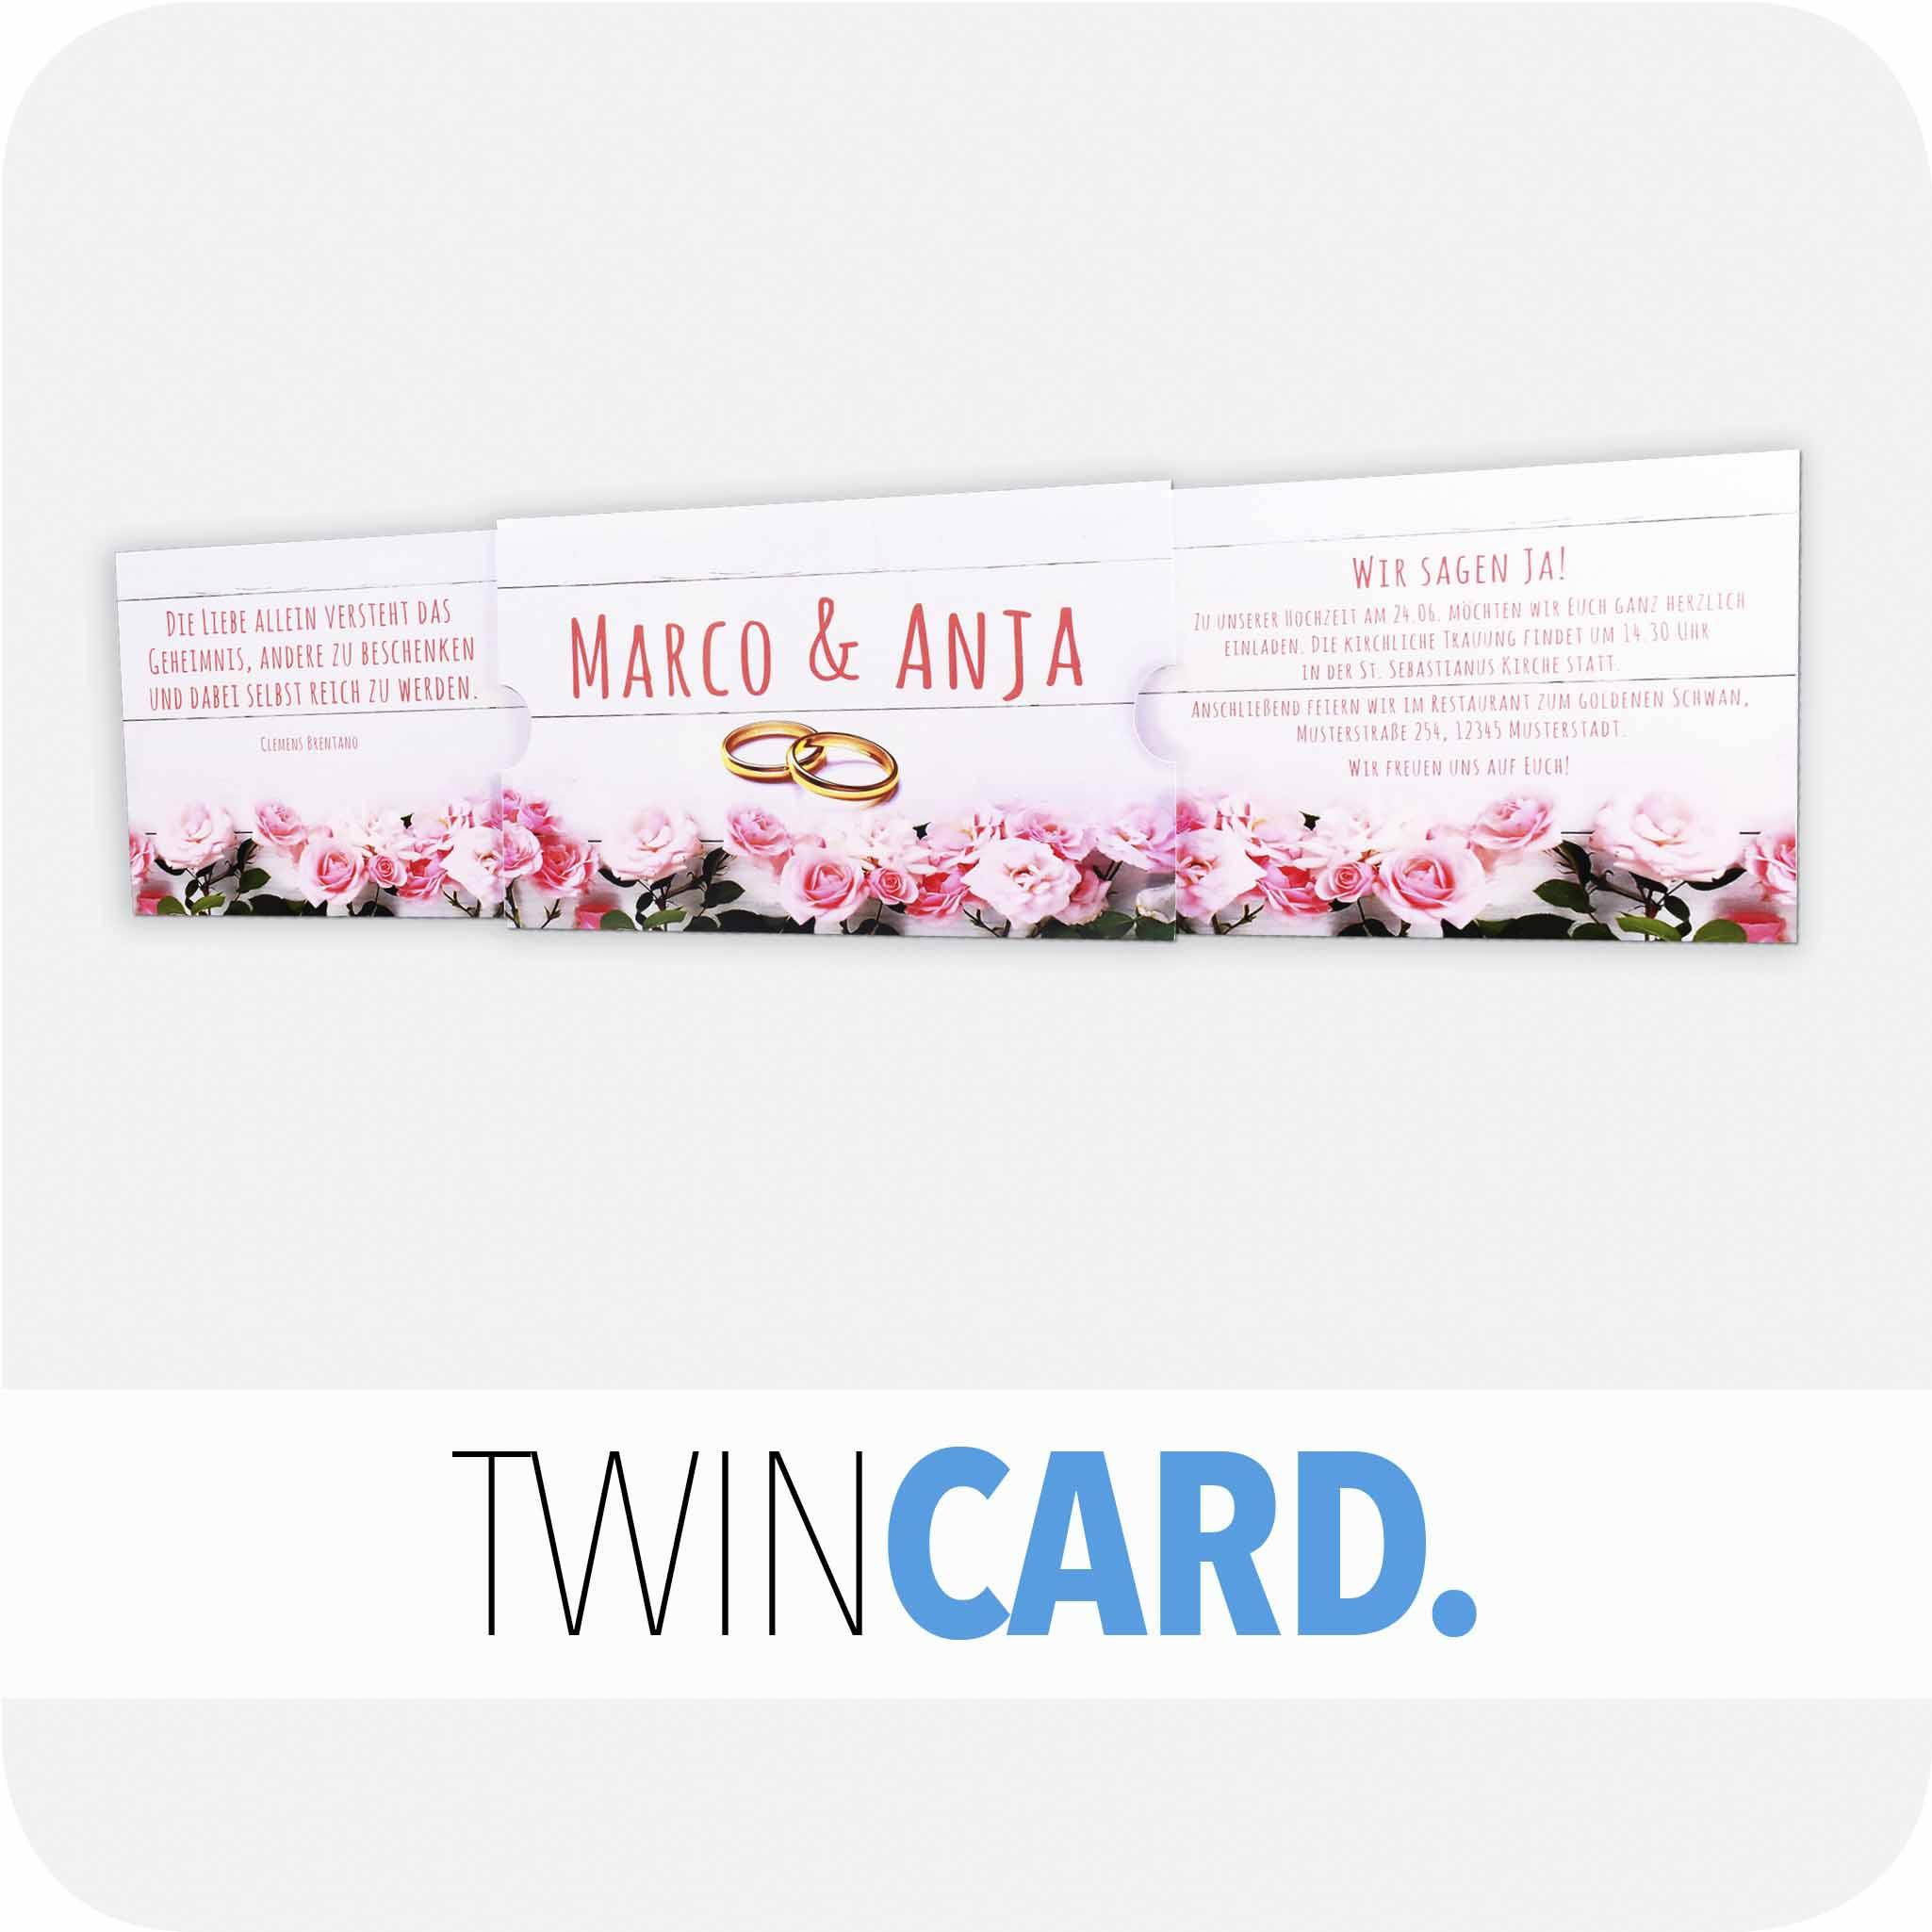 Twincard